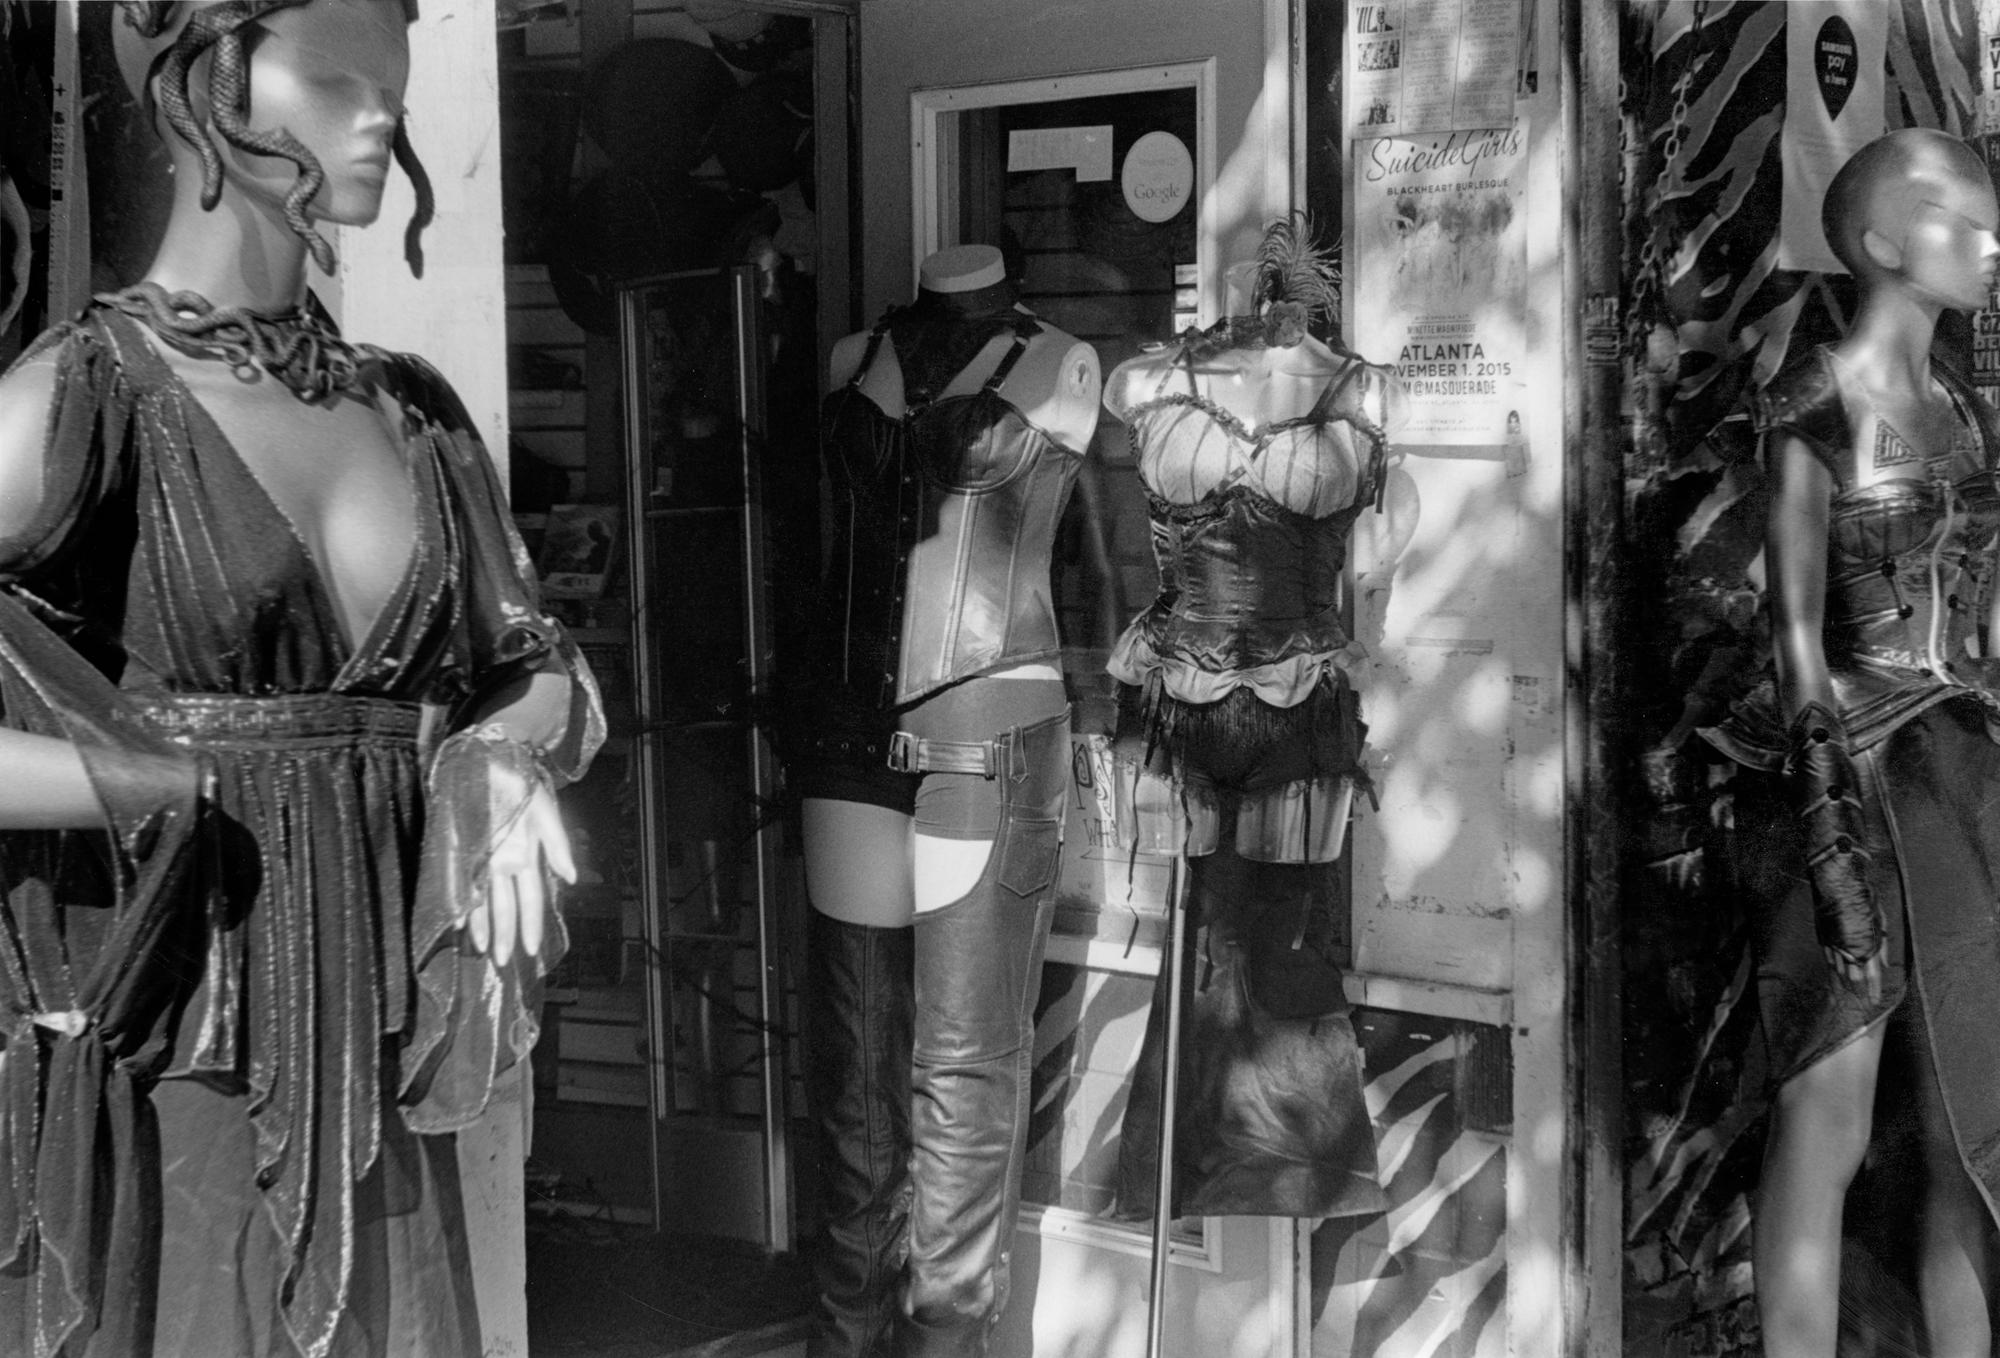 Penelope_Stone-Window_Shopping-3.jpg